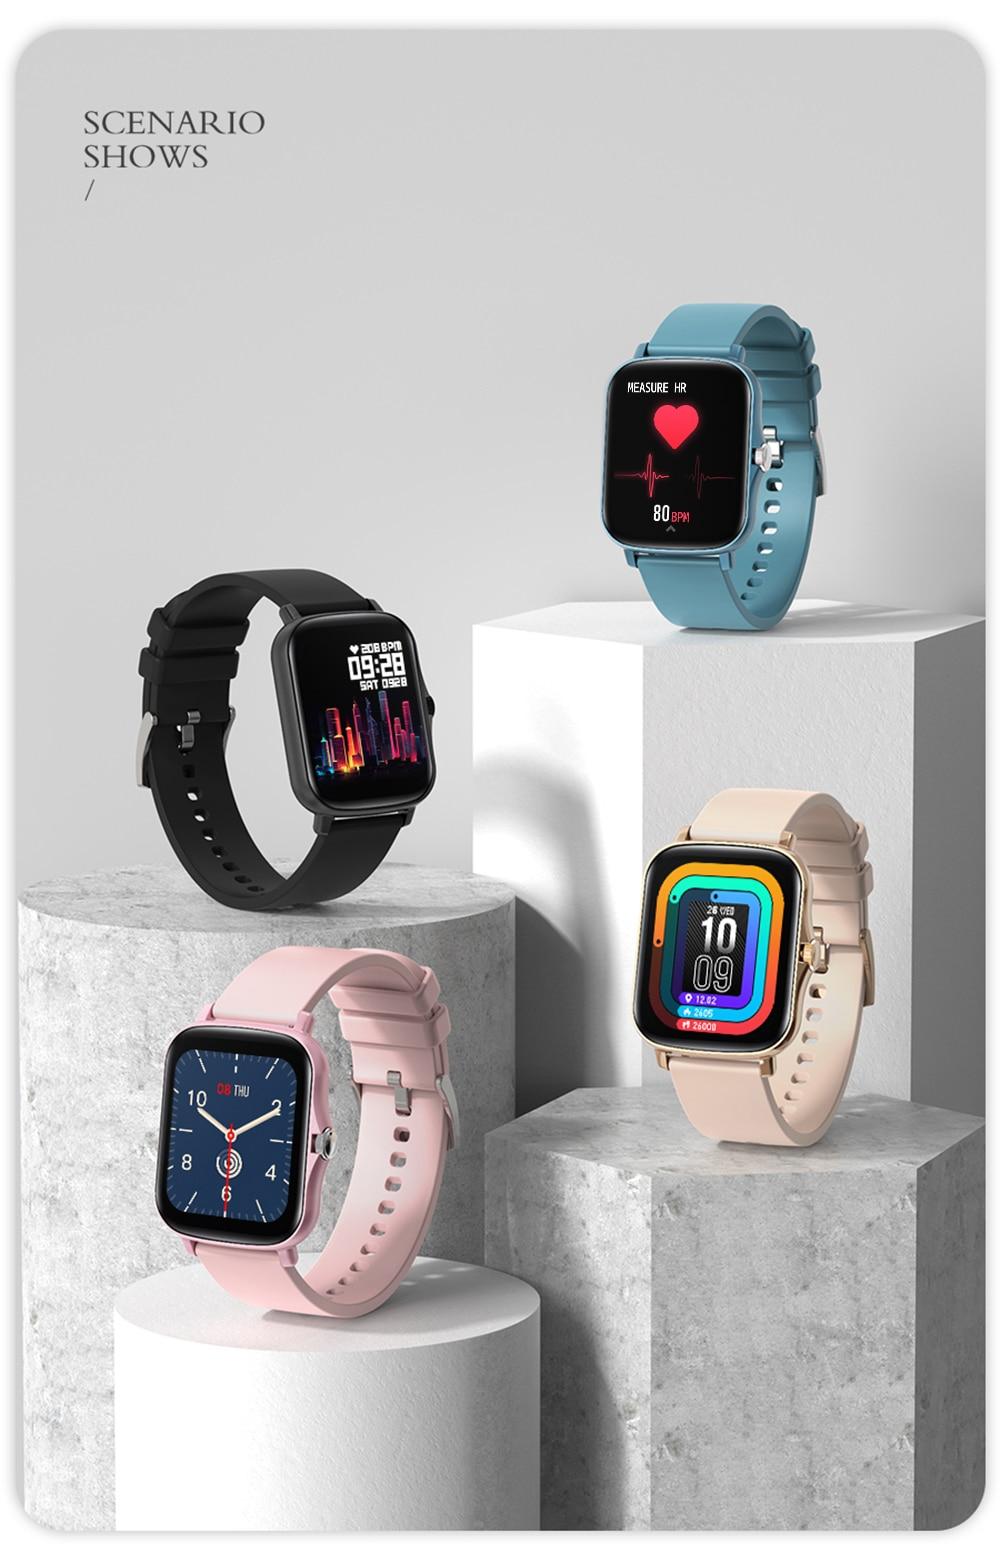 H6c4d05e08650498a95da2764f193066aj COLMI P8 Plus 1.69 inch 2021 Smart Watch Men Full Touch Fitness Tracker IP67 waterproof Women GTS 2 Smartwatch for Xiaomi phone